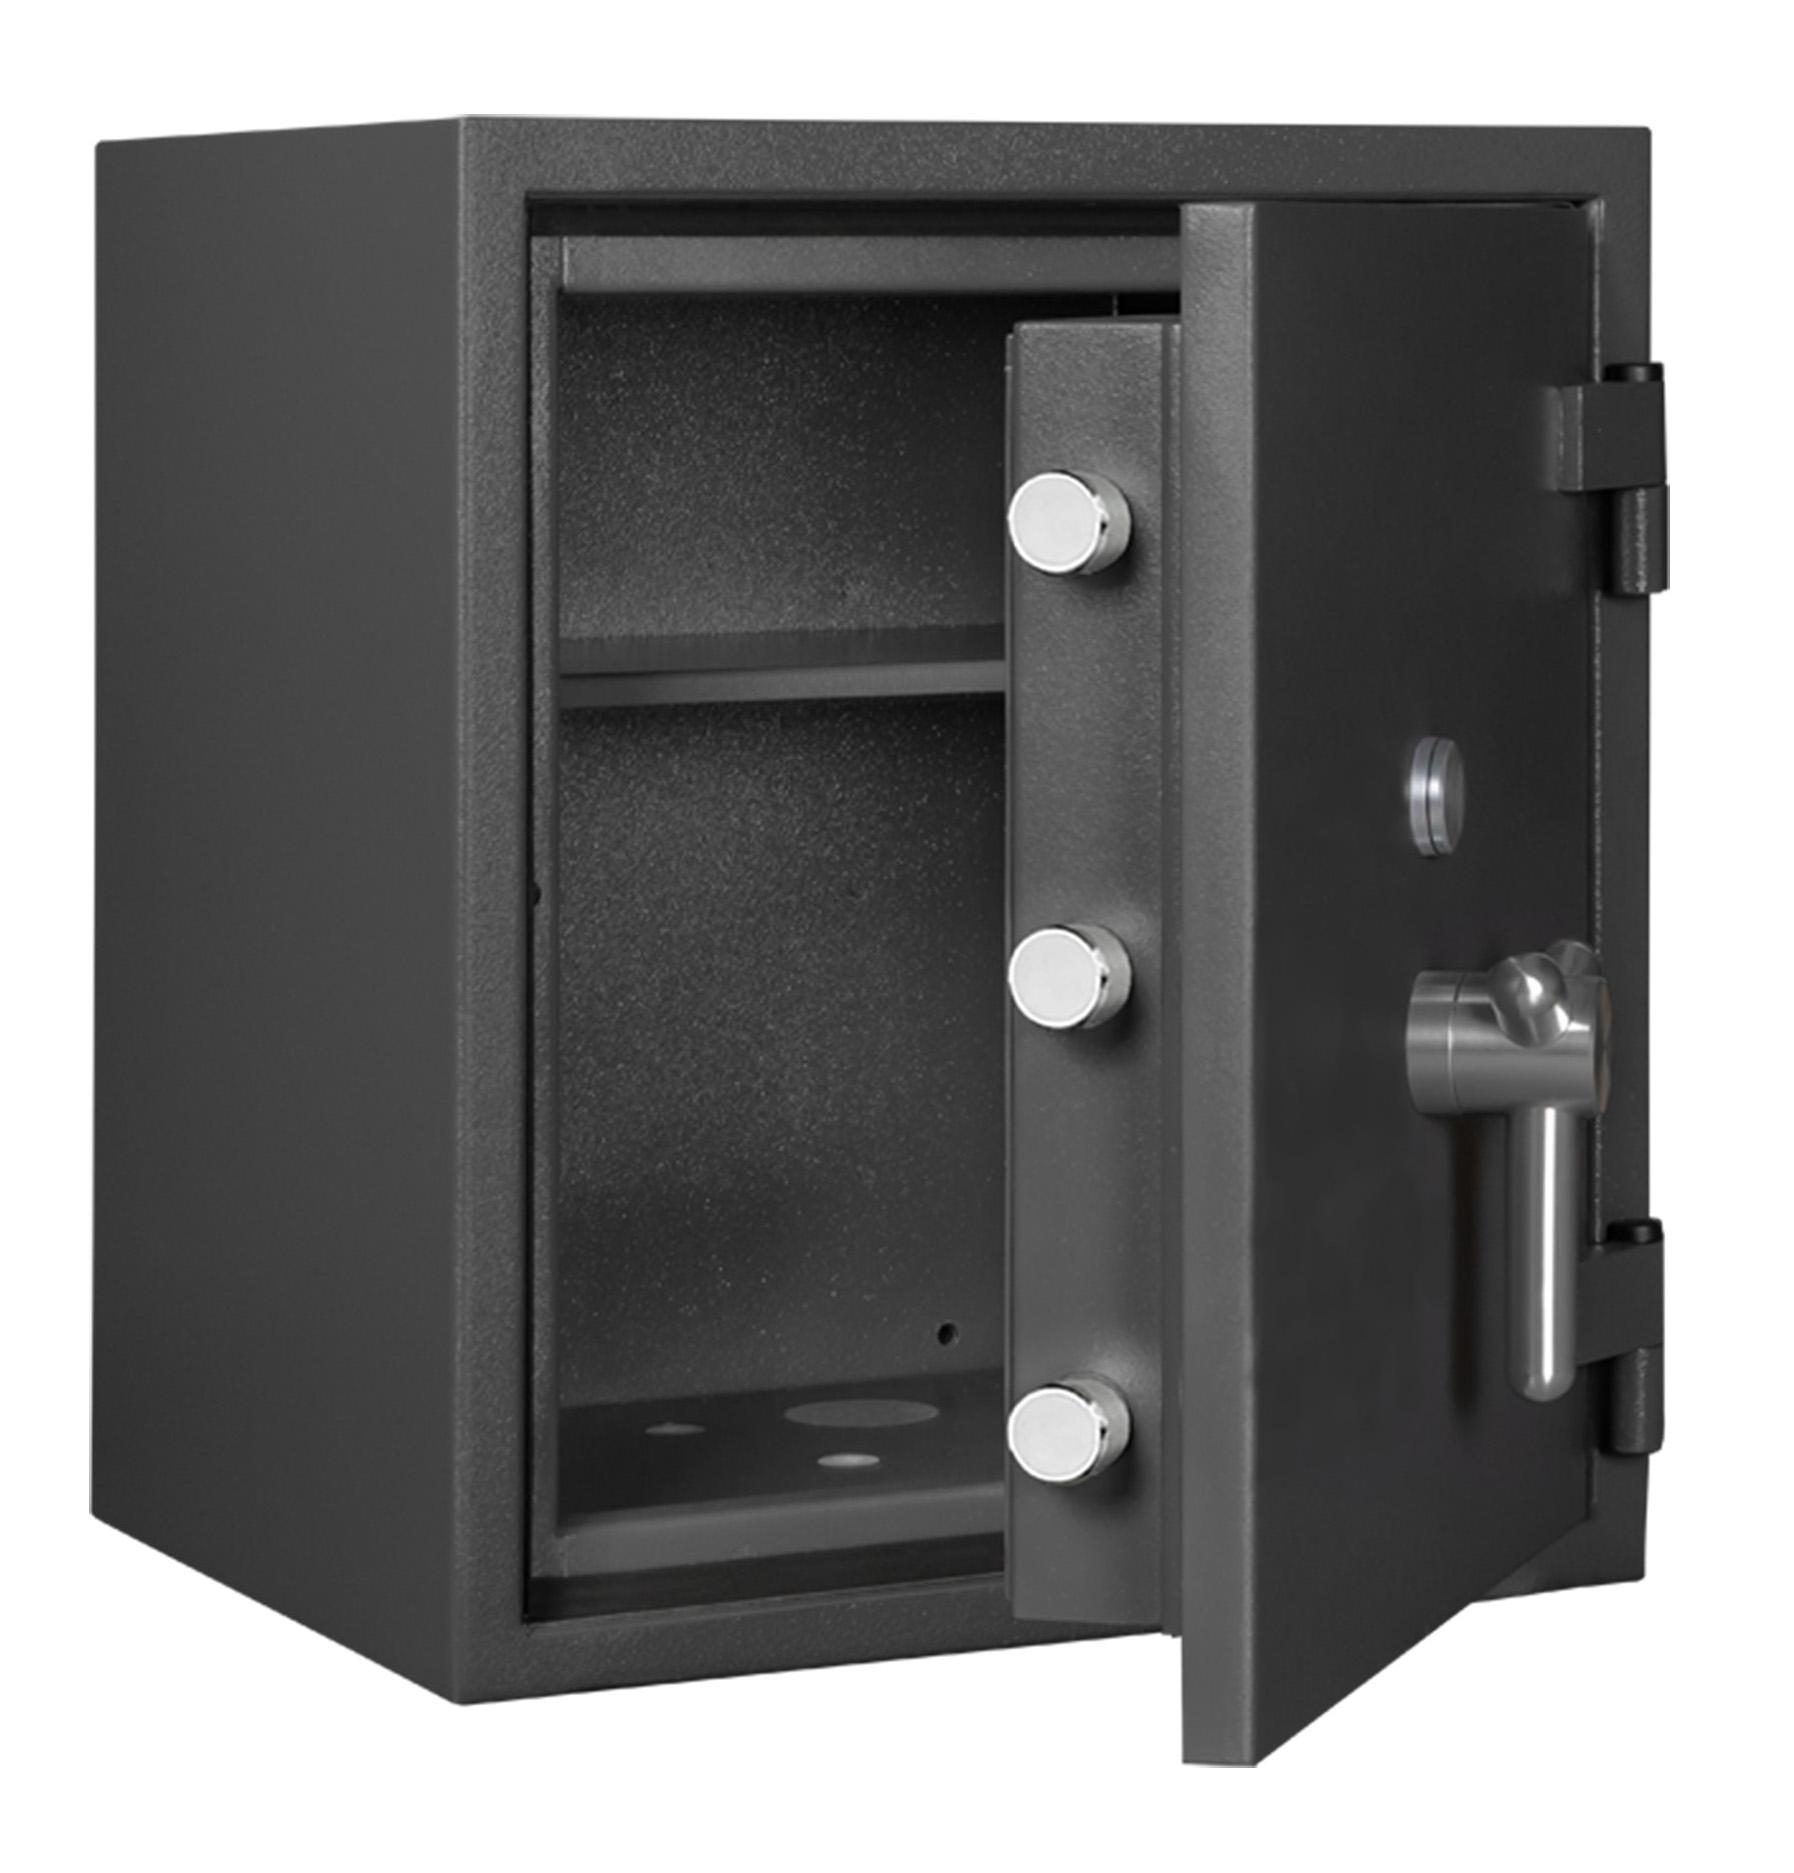 wertschutz tresor format rubin pro 5 vds klasse 3 tresor. Black Bedroom Furniture Sets. Home Design Ideas